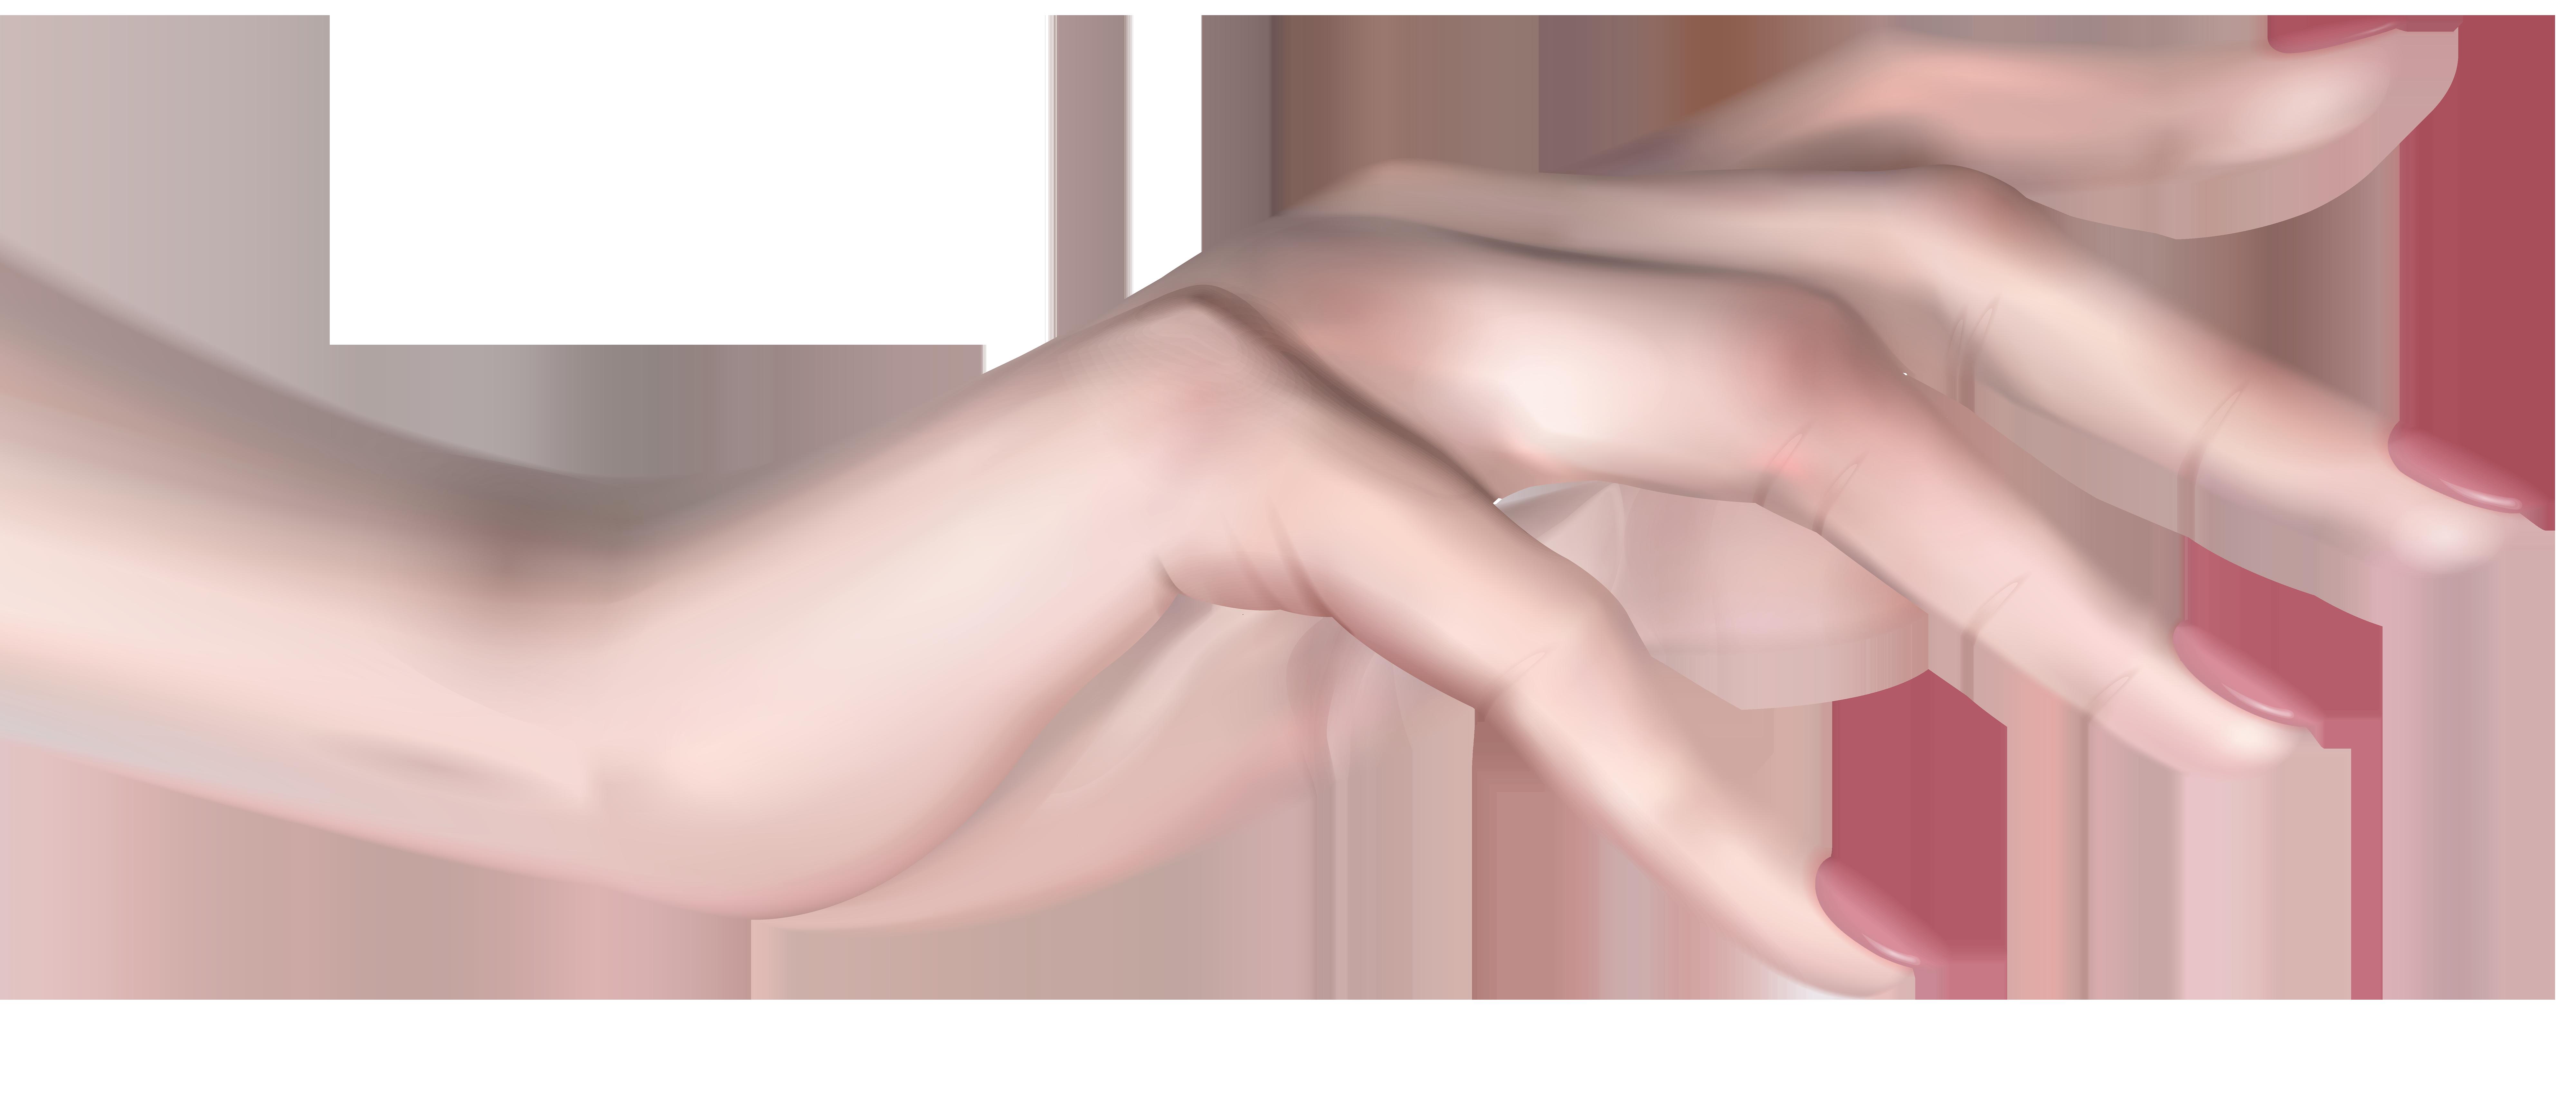 Hand clipart arm. Female png clip art